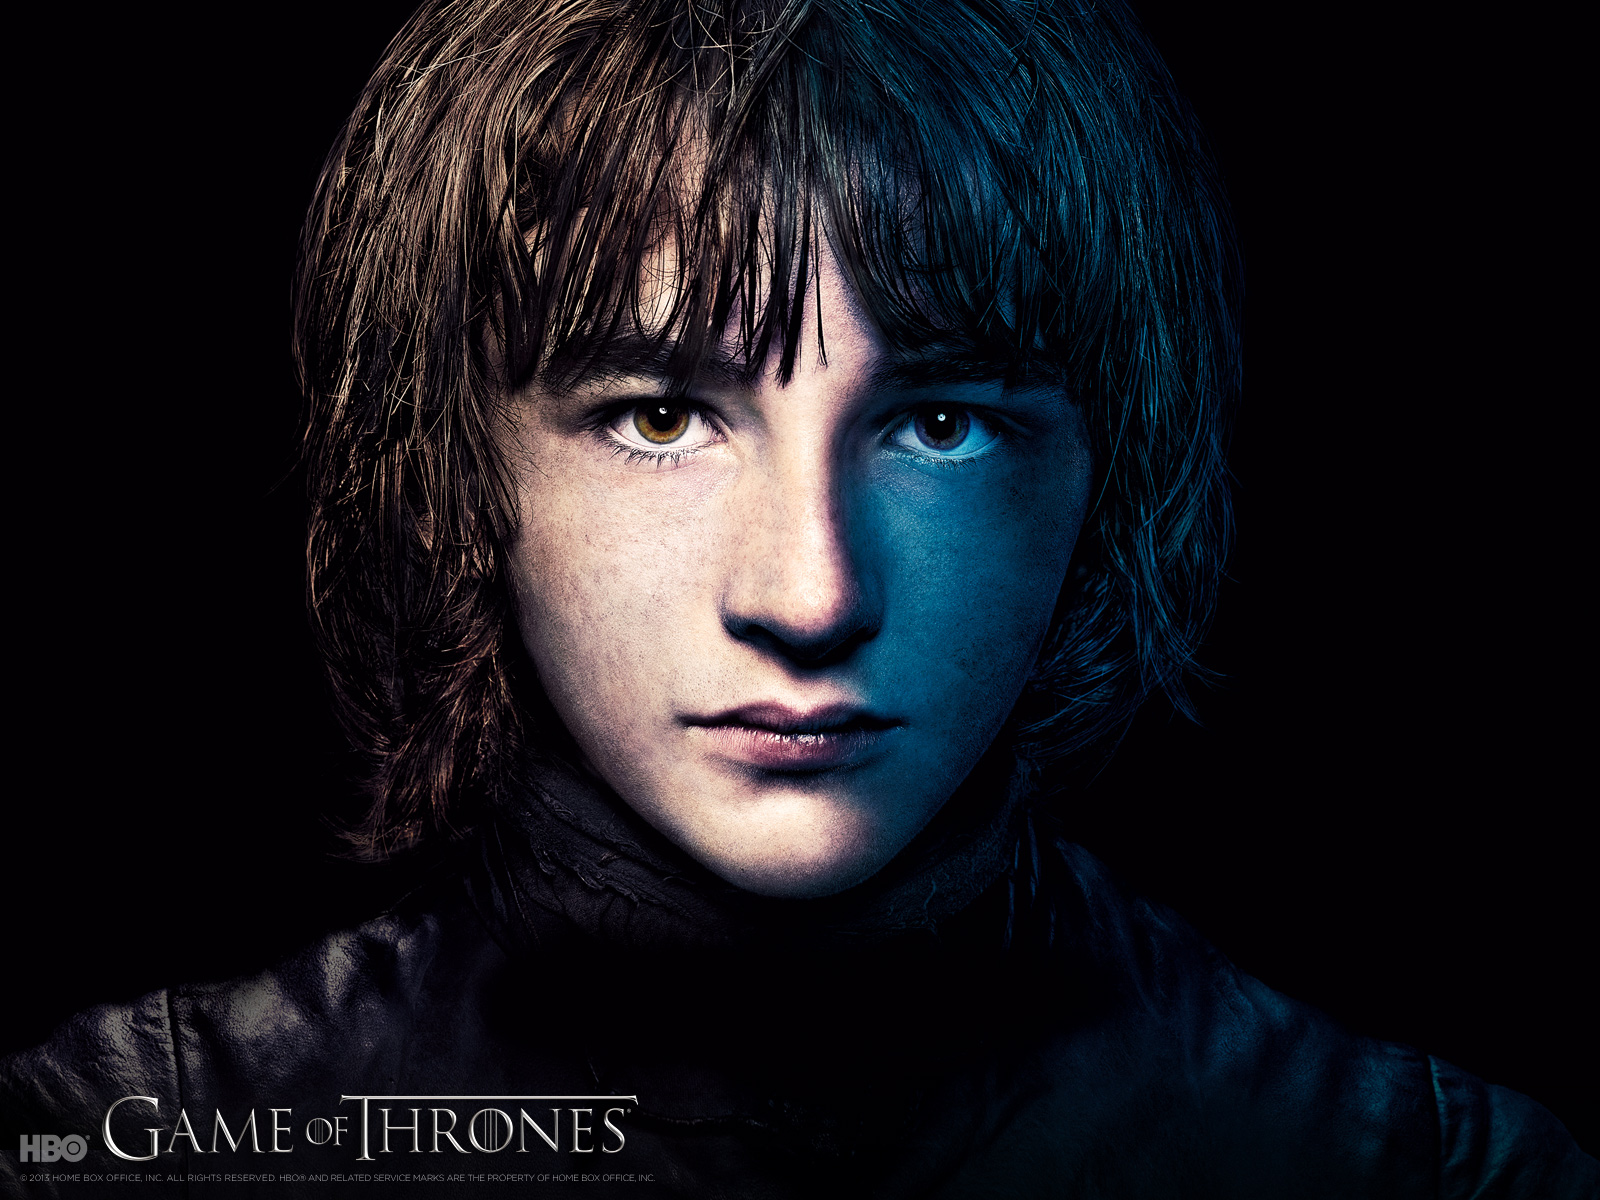 Bran Stark S3   Bran Stark Wallpaper 33787457 1600x1200